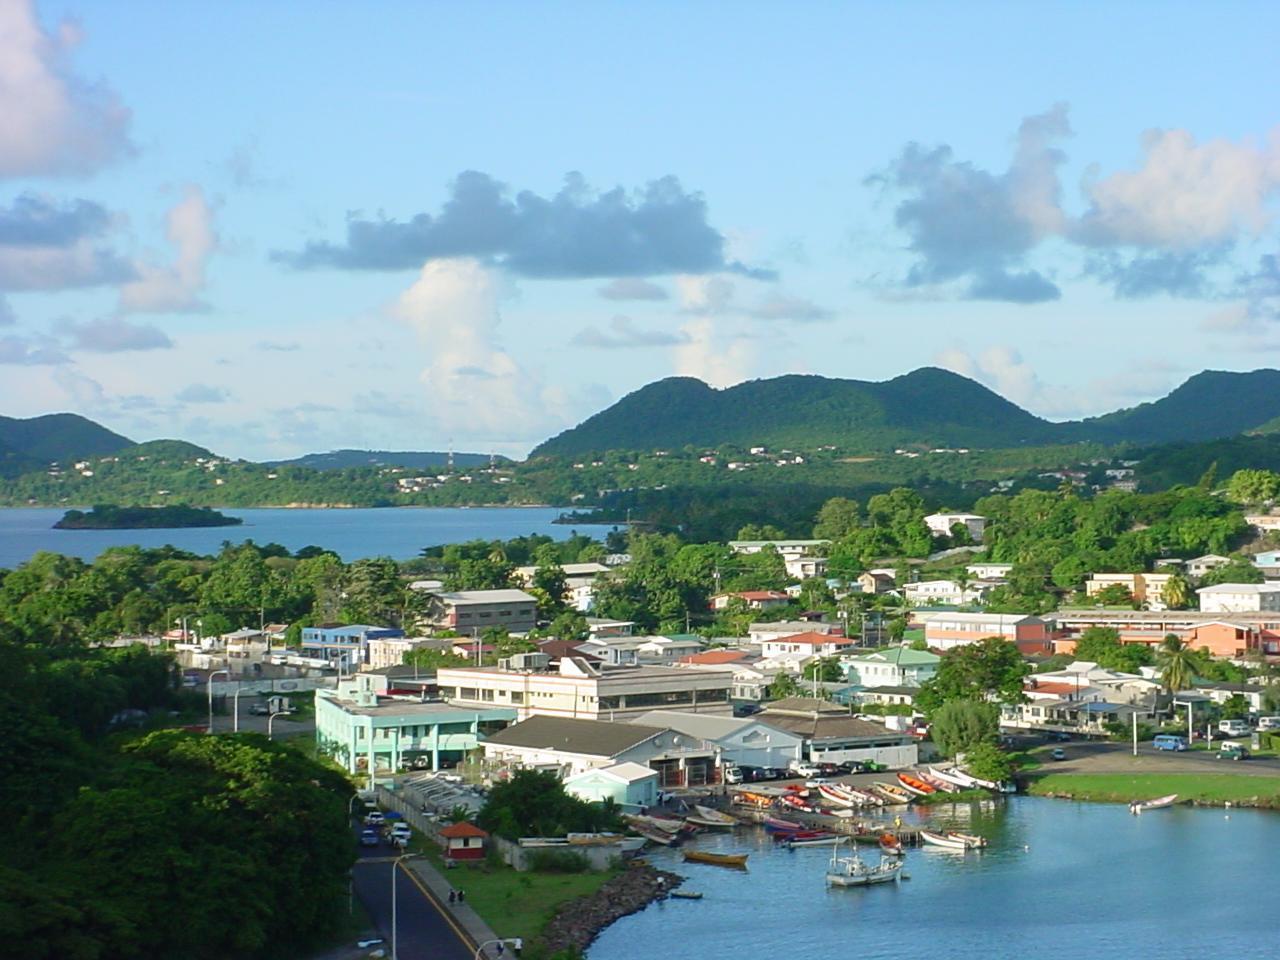 caribbean island postcard wallpaper - photo #24